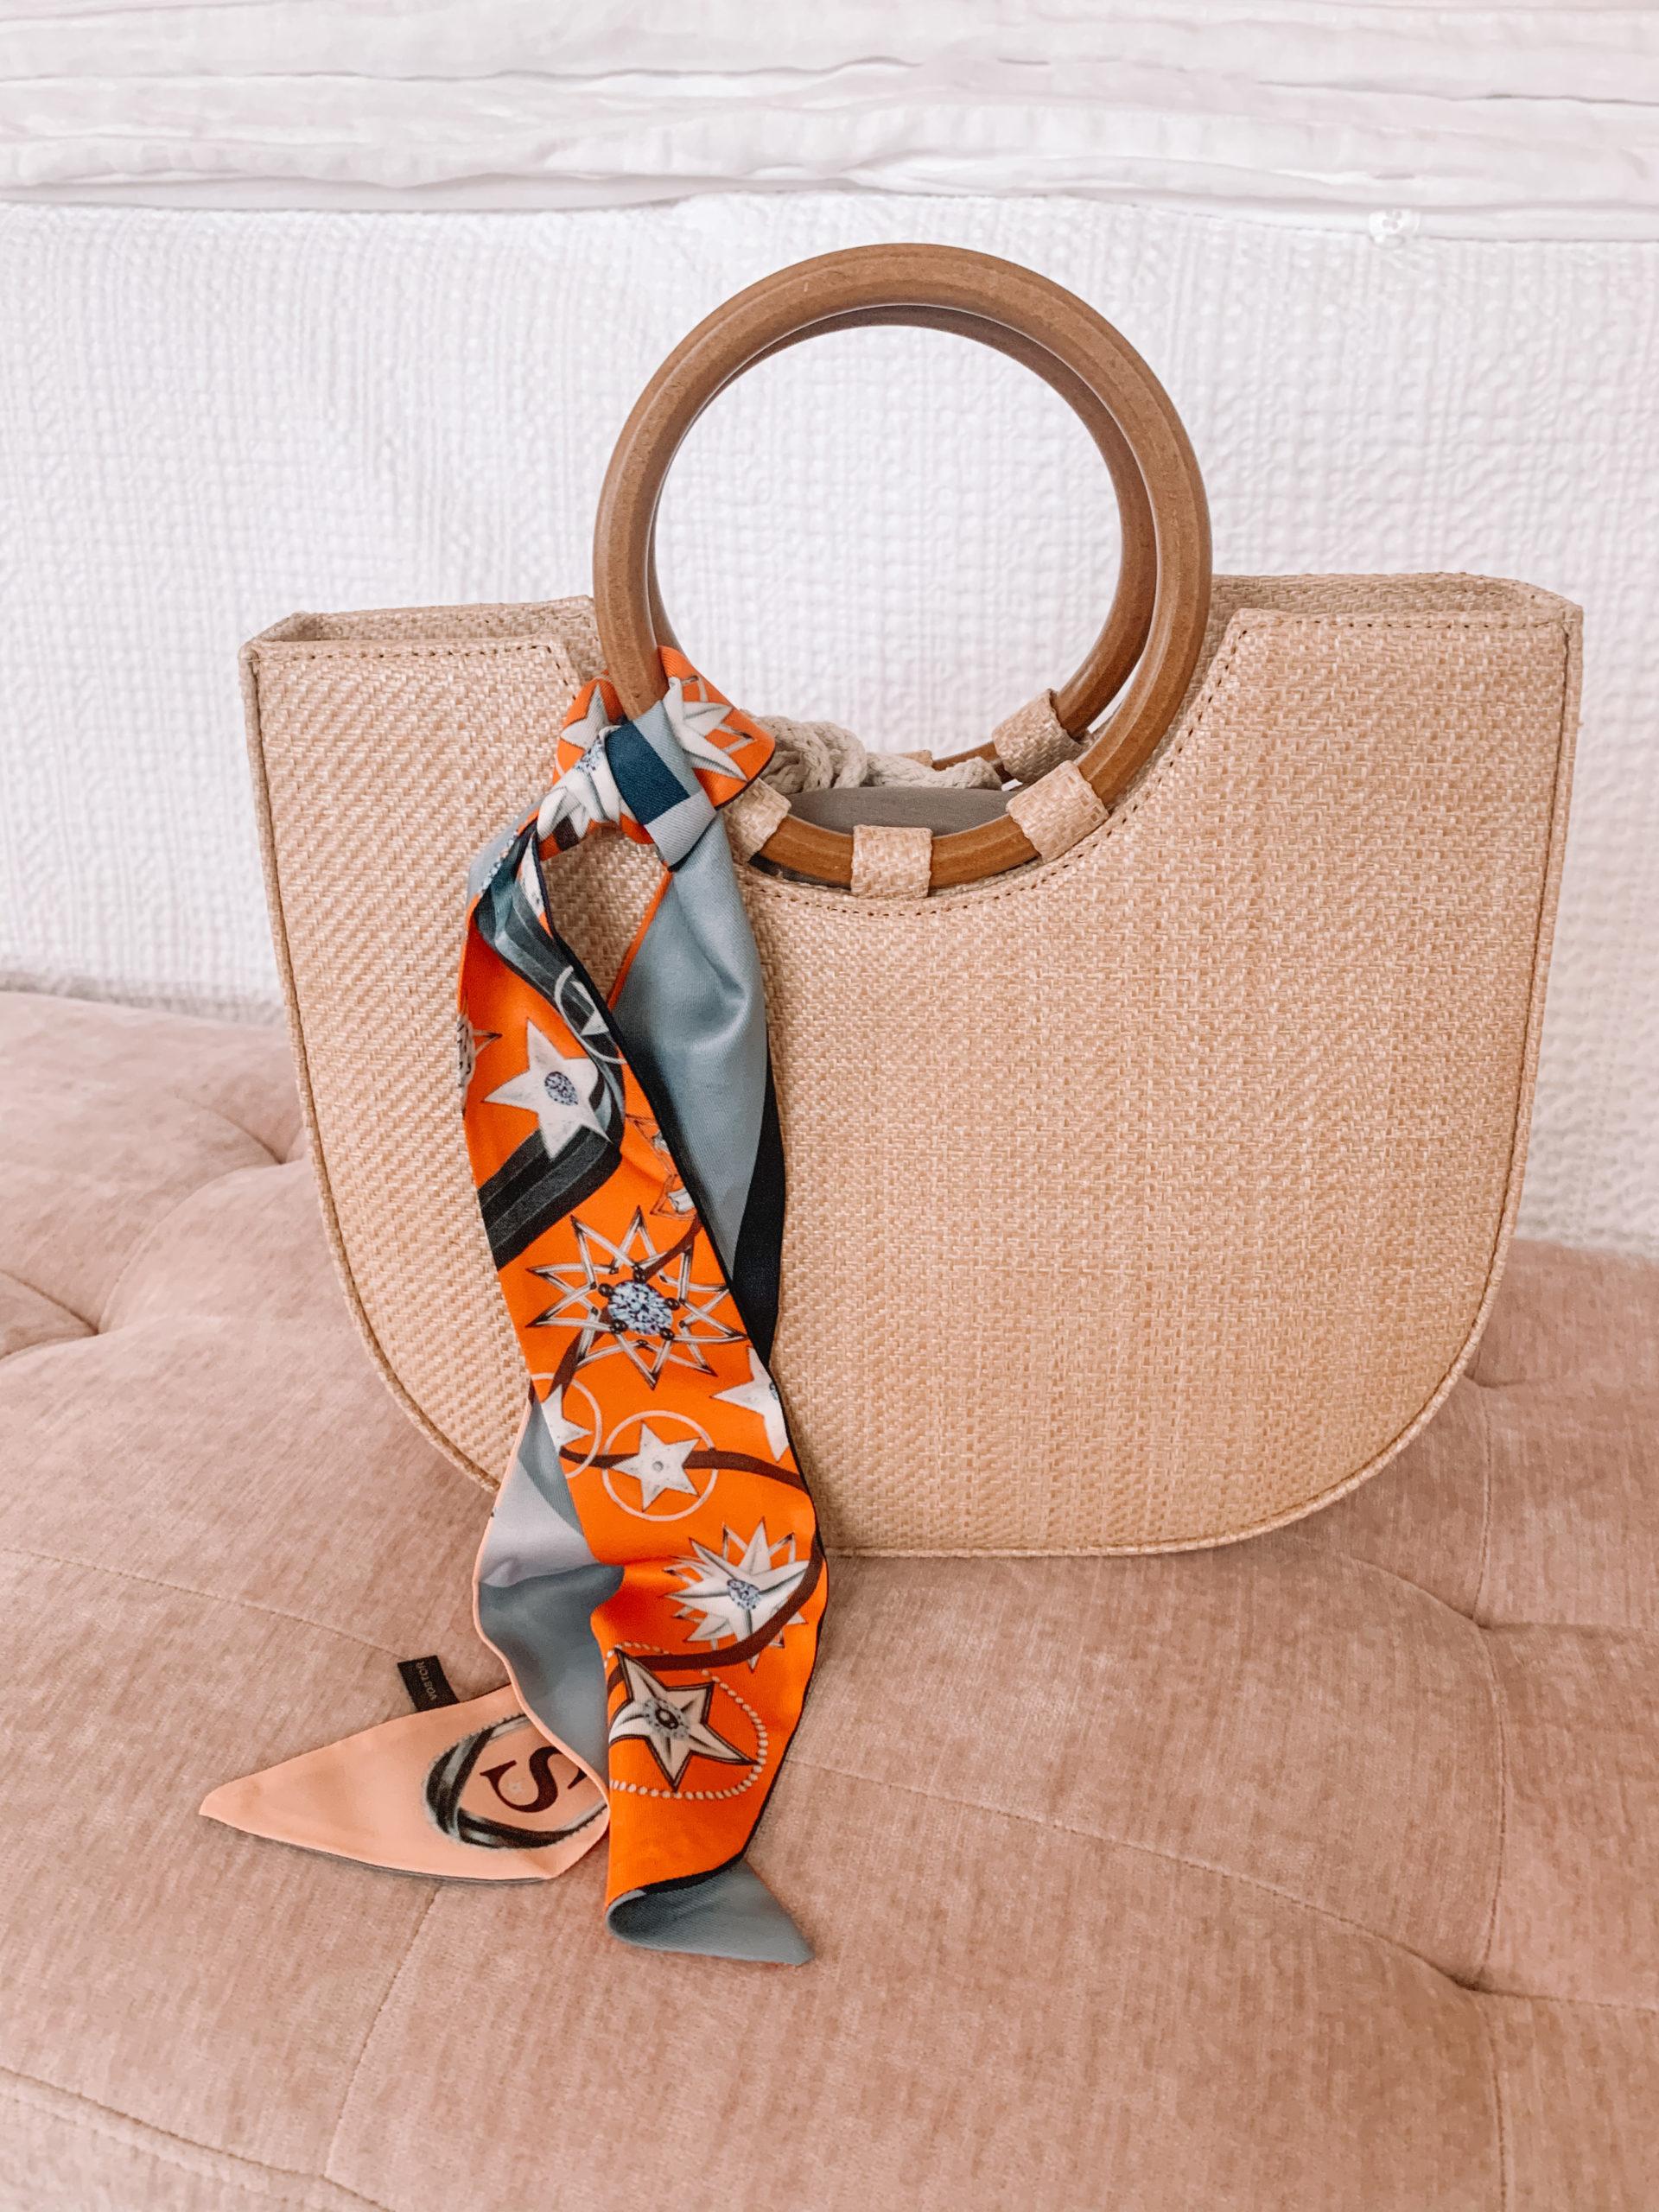 Amazon Fashion - Woven Tote Bag